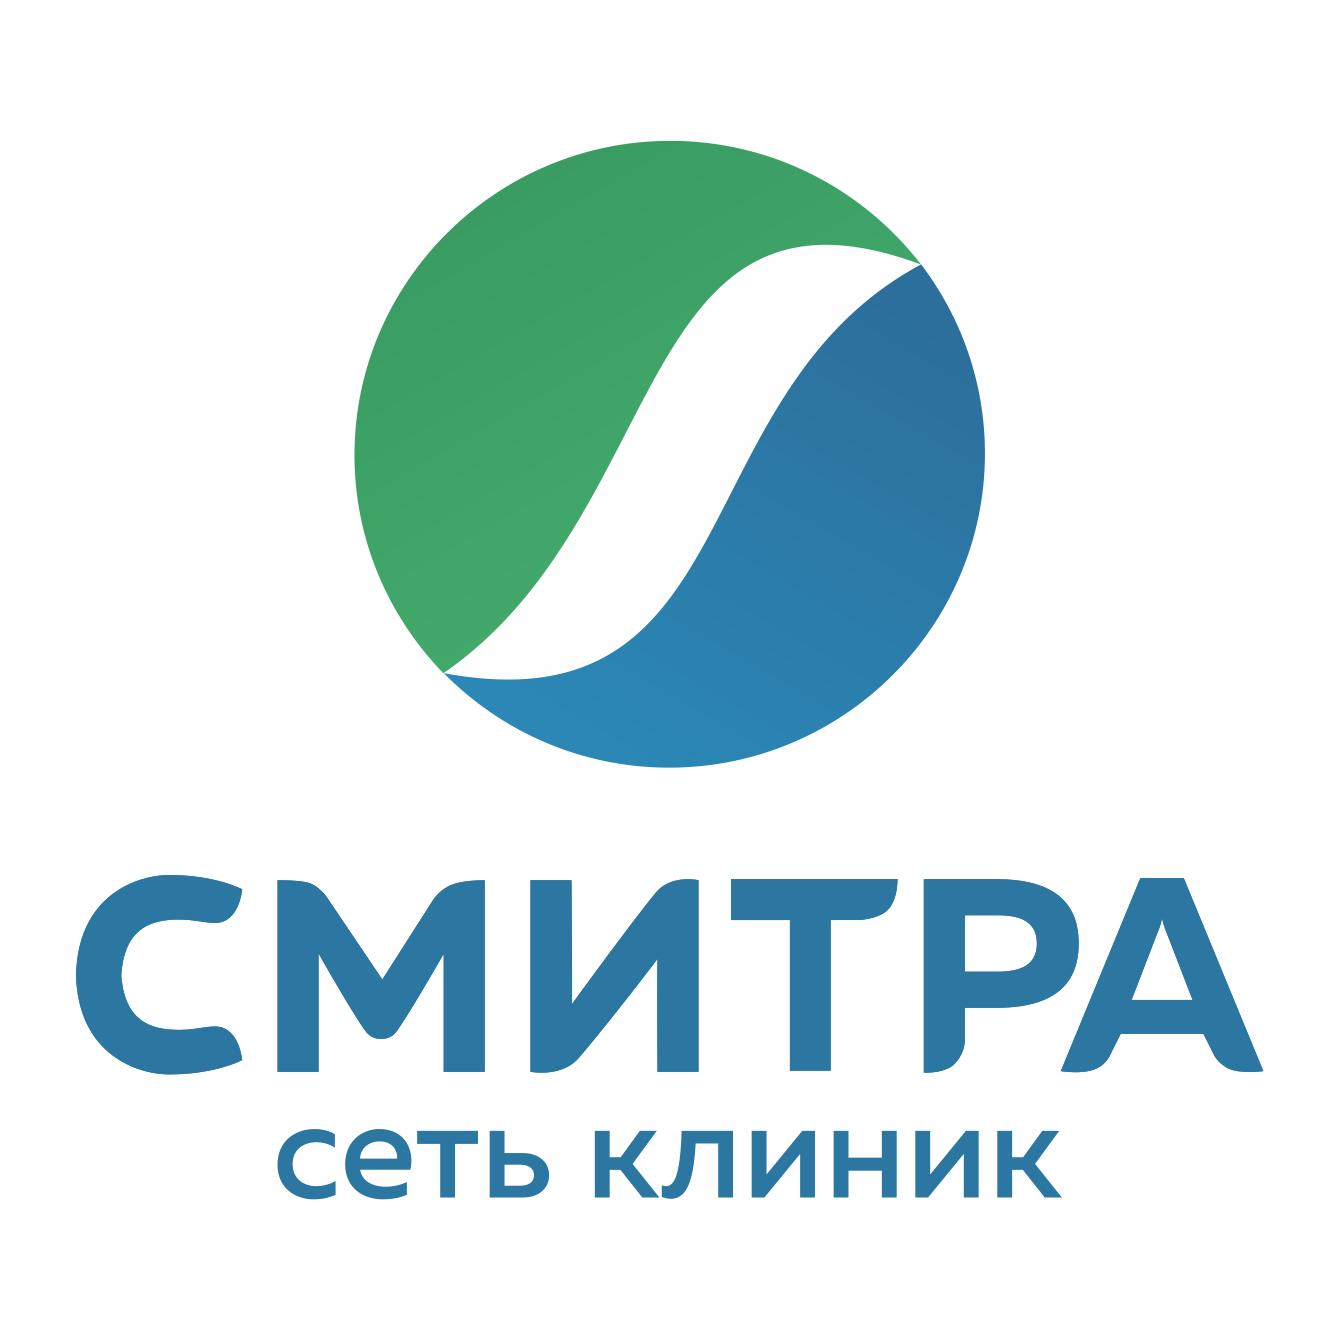 Клиника «СМИТРА» на метро Золотая Нива